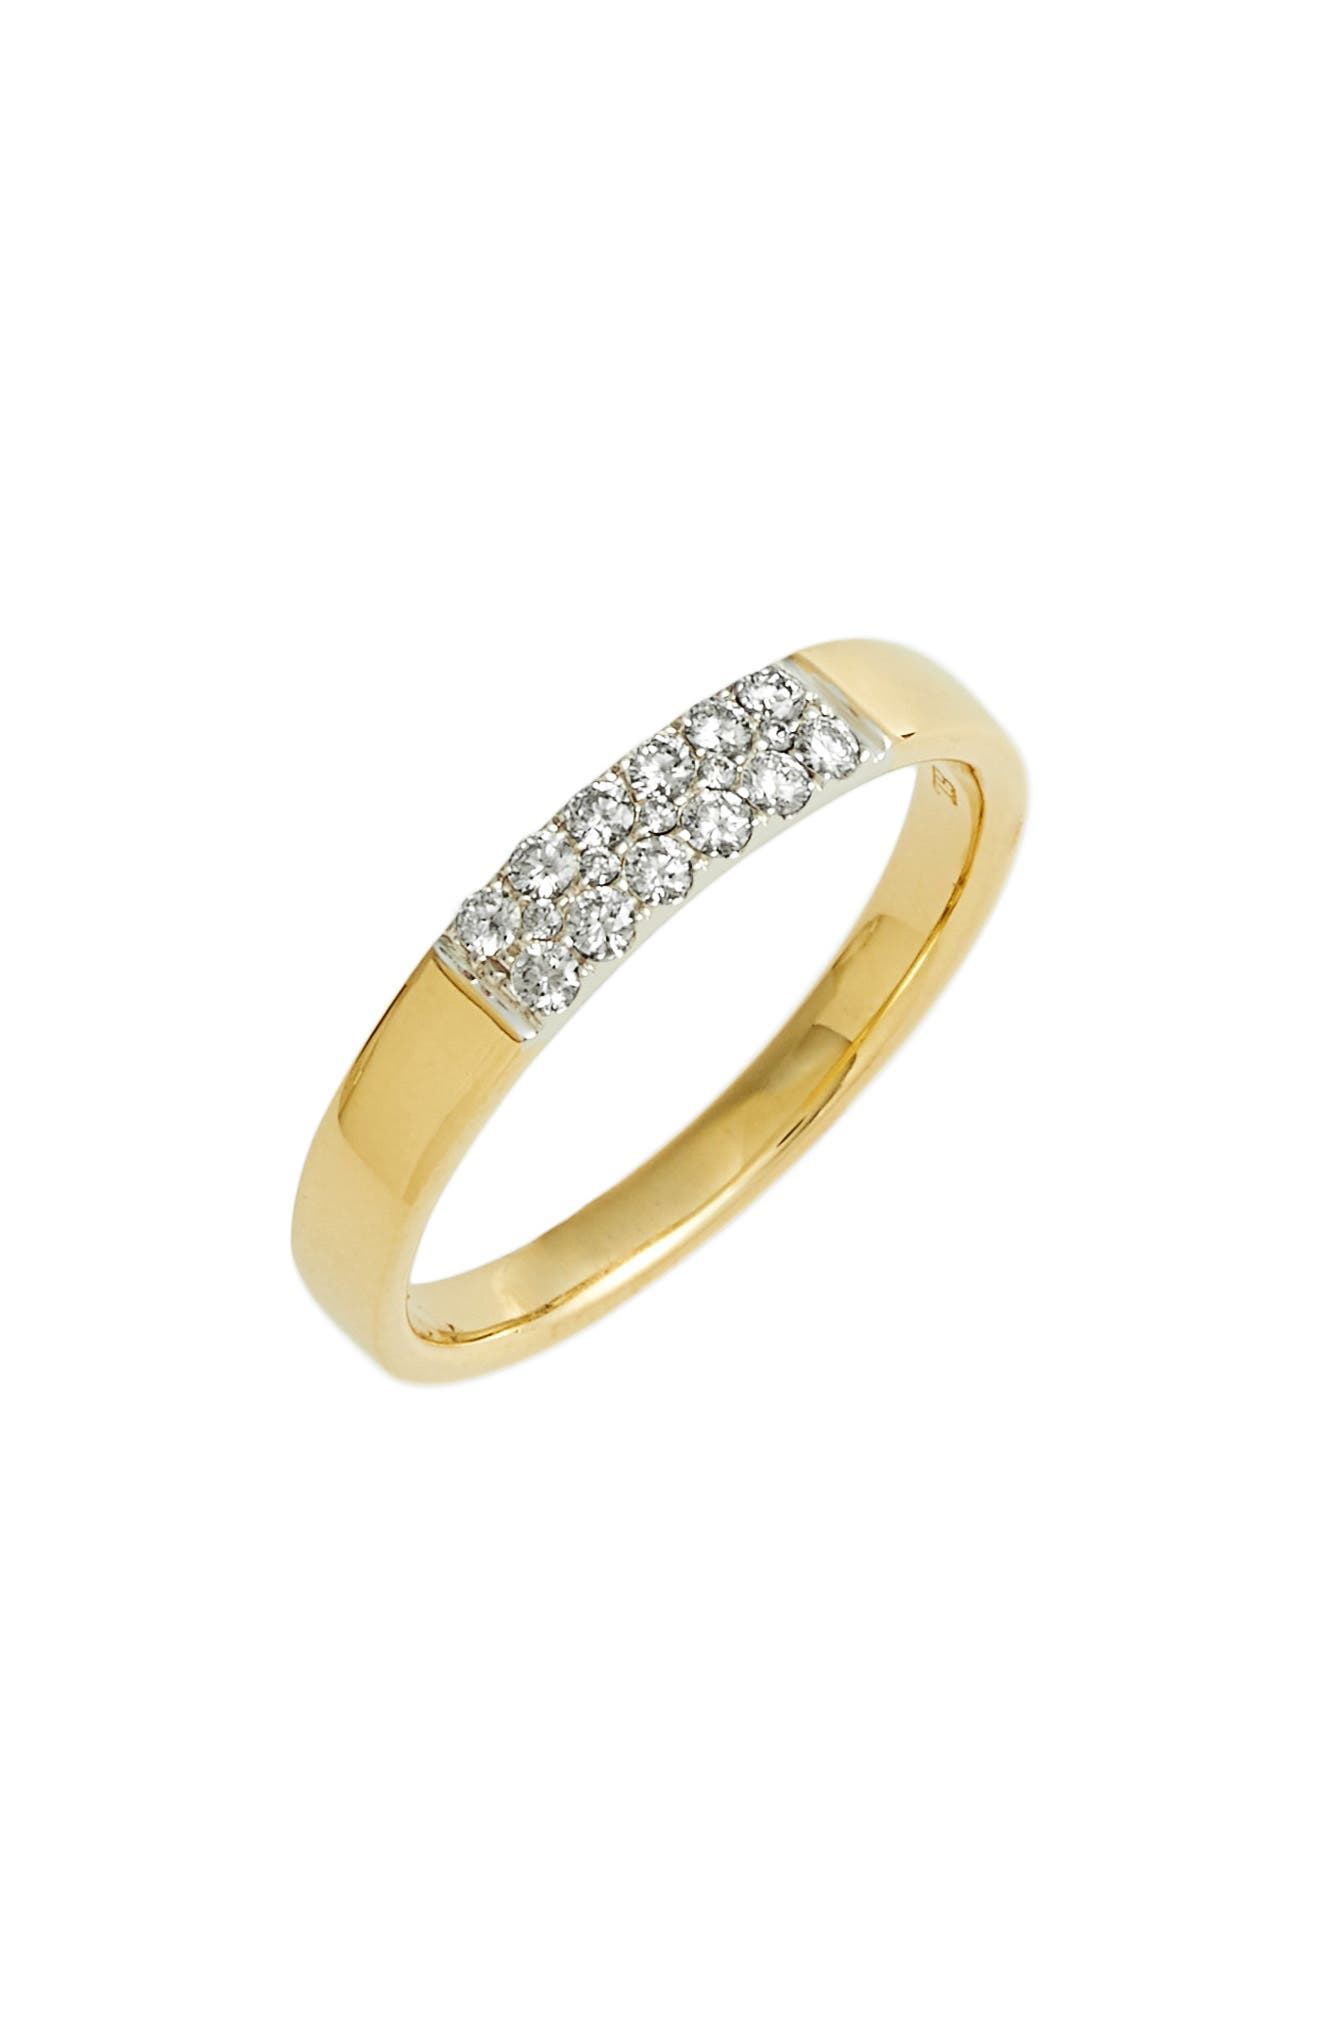 Kiera Diamond Stacking Ring,                         Main,                         color, YELLOW GOLD/ WHITE GOLD